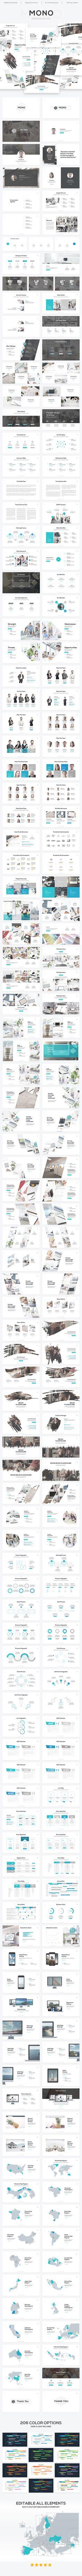 Mono - Minimal Theme - #PowerPoint Templates #Presentation #Templates Download here: https://graphicriver.net/item/mono-minimal-theme/19490631?ref=alena994